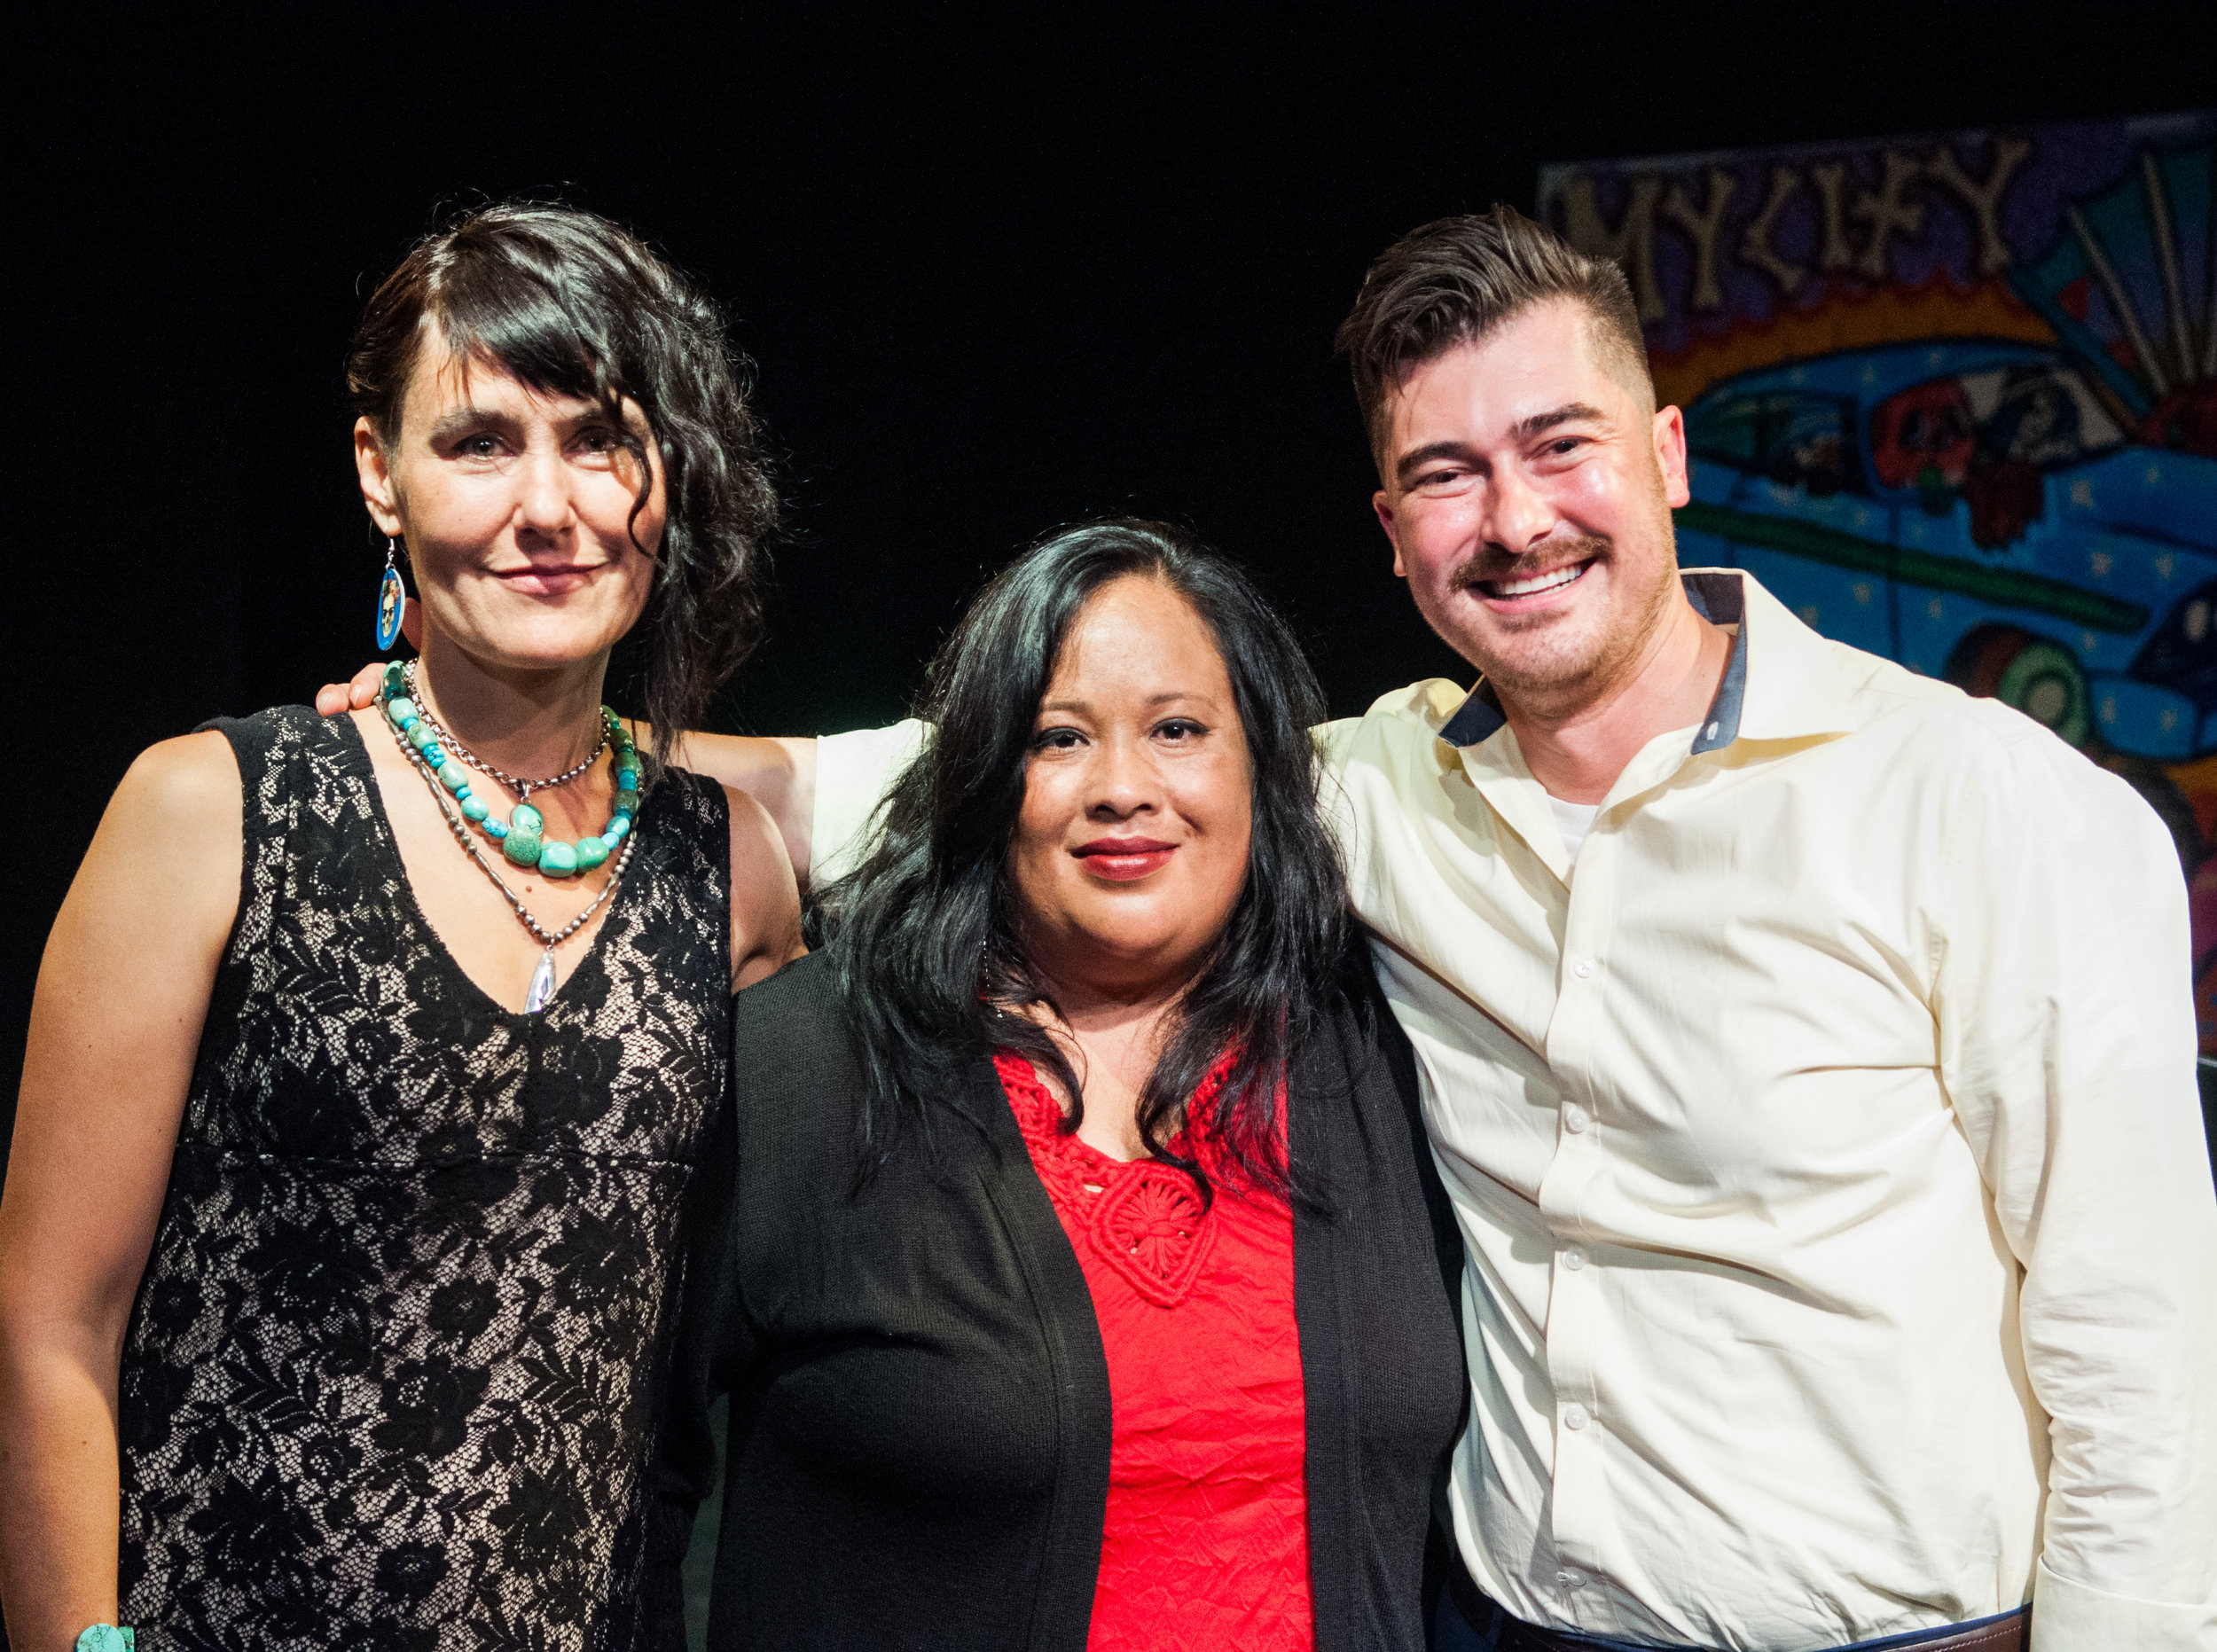 [Left to right] Dawn Joella Jackson, Anabertha Alvarado, and the creator of Voz Alta, Joaquin Lopez